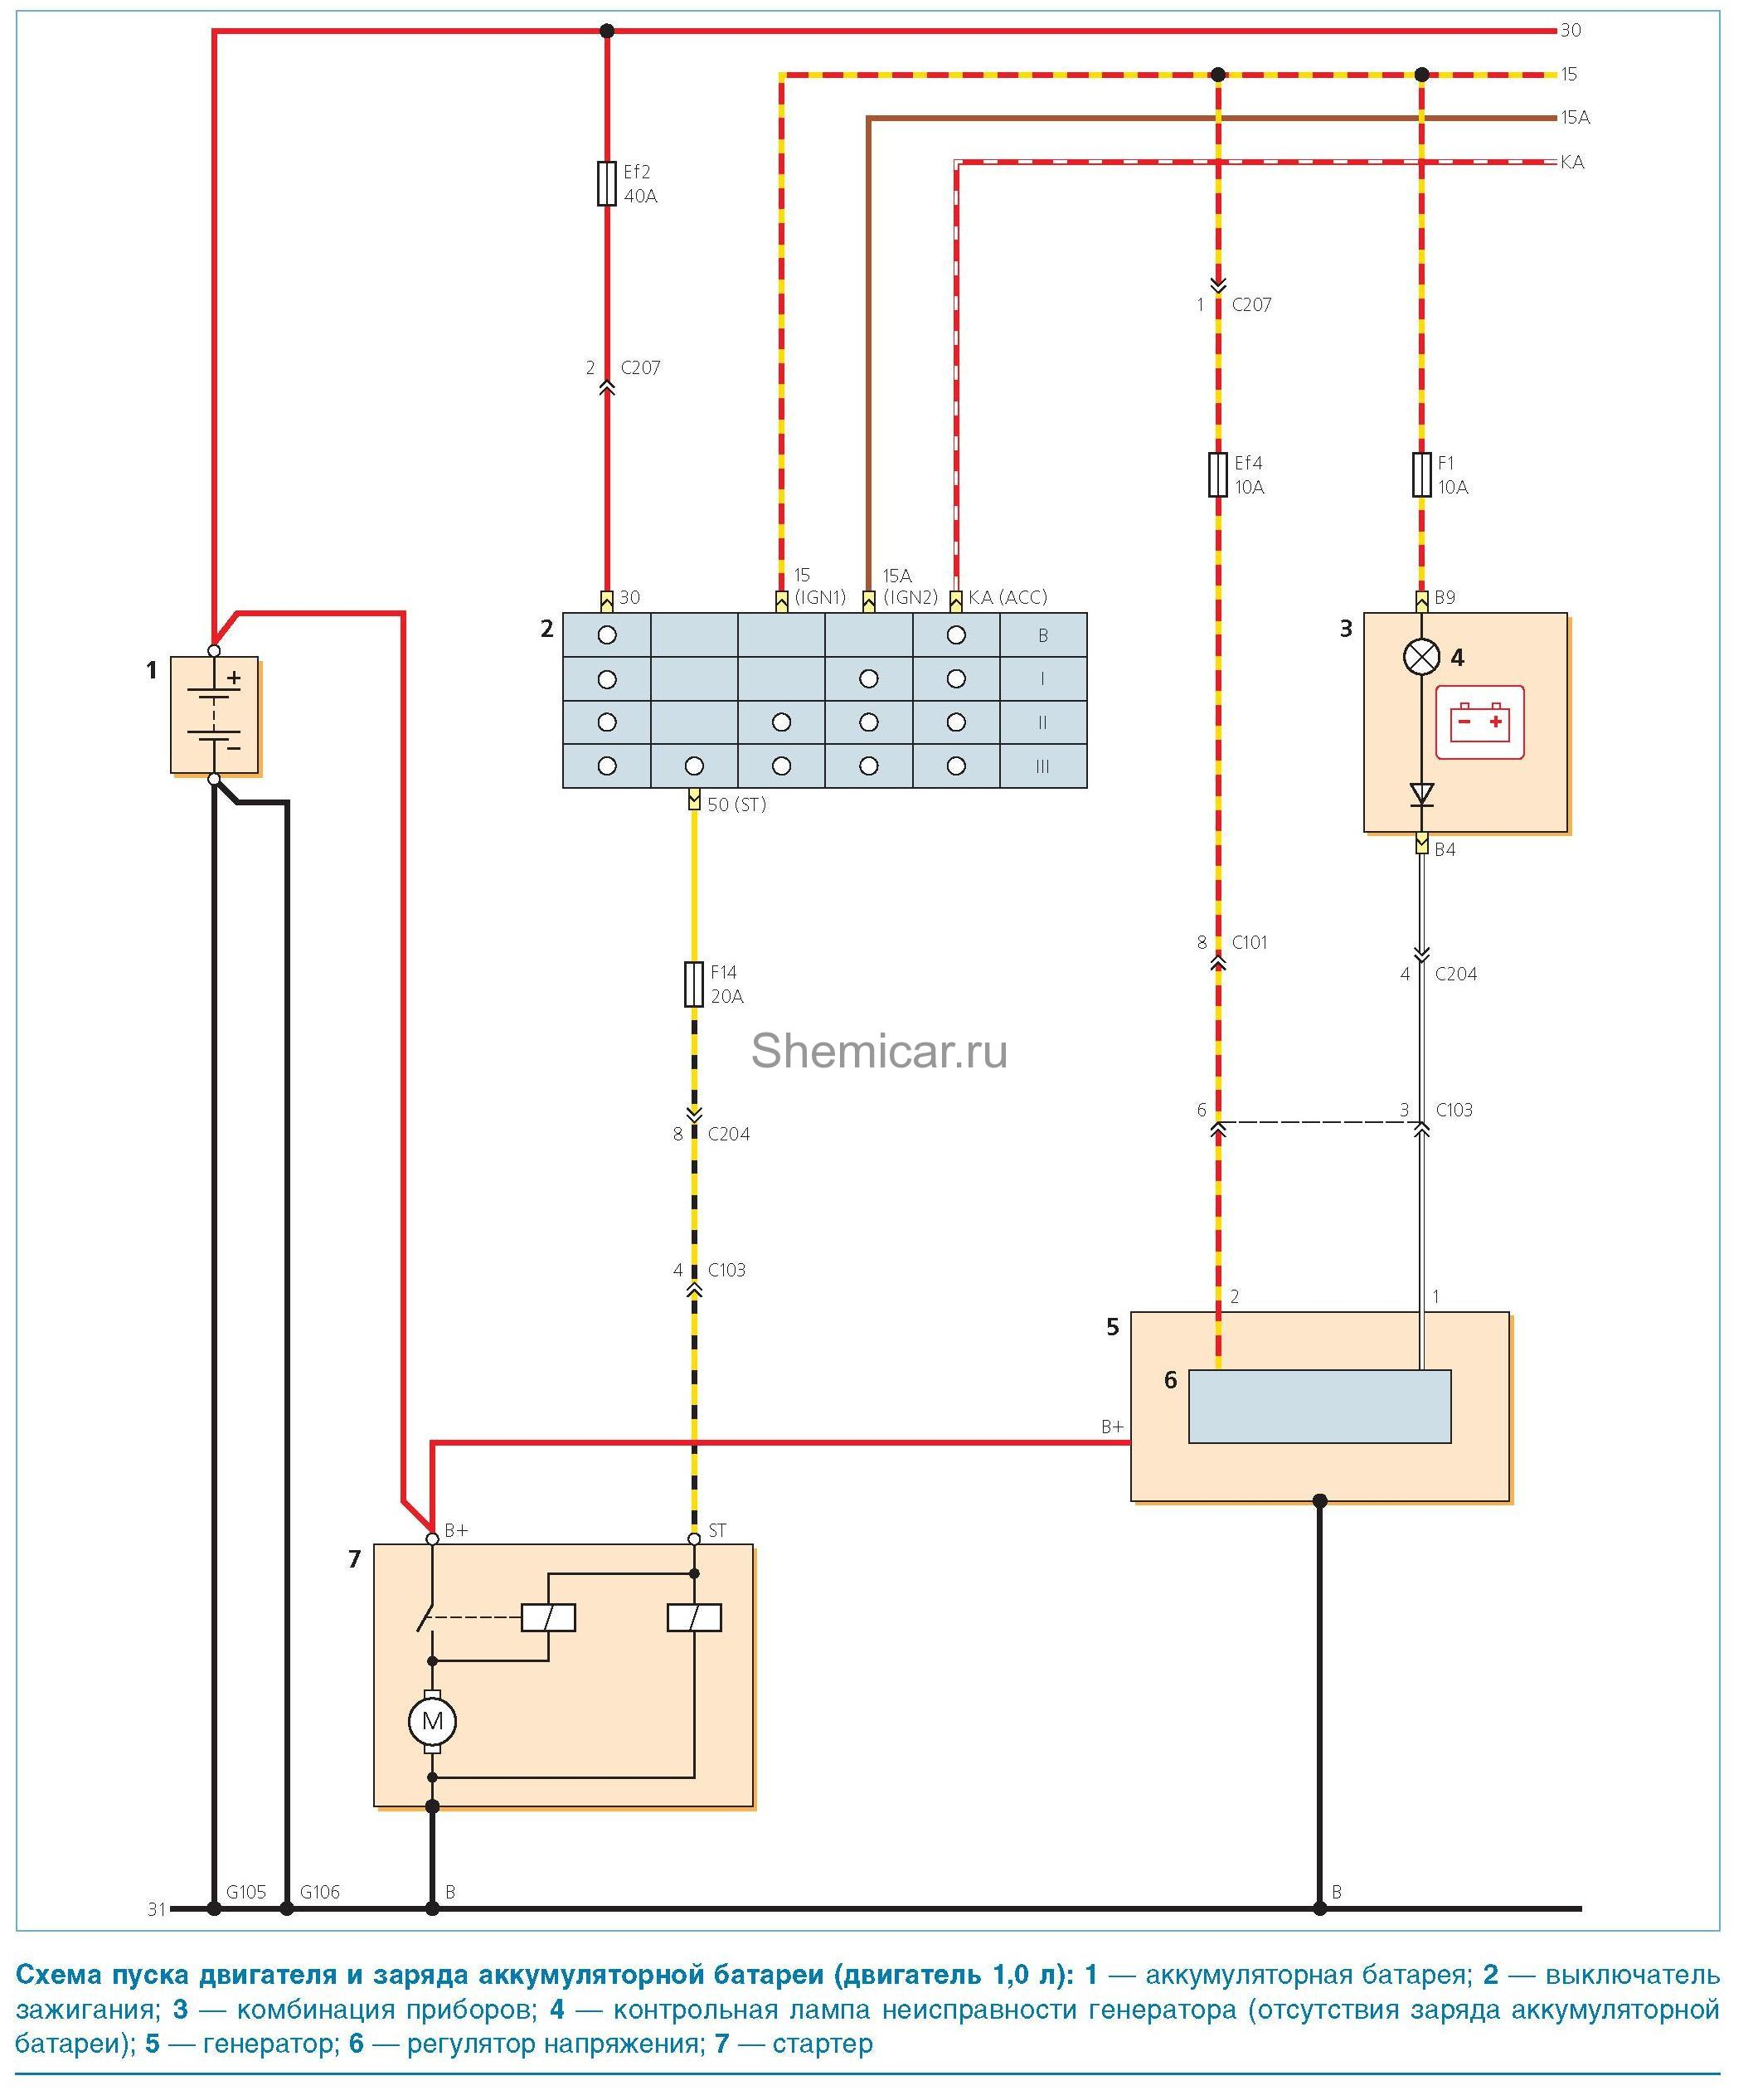 Электронная схема для дэу матиз